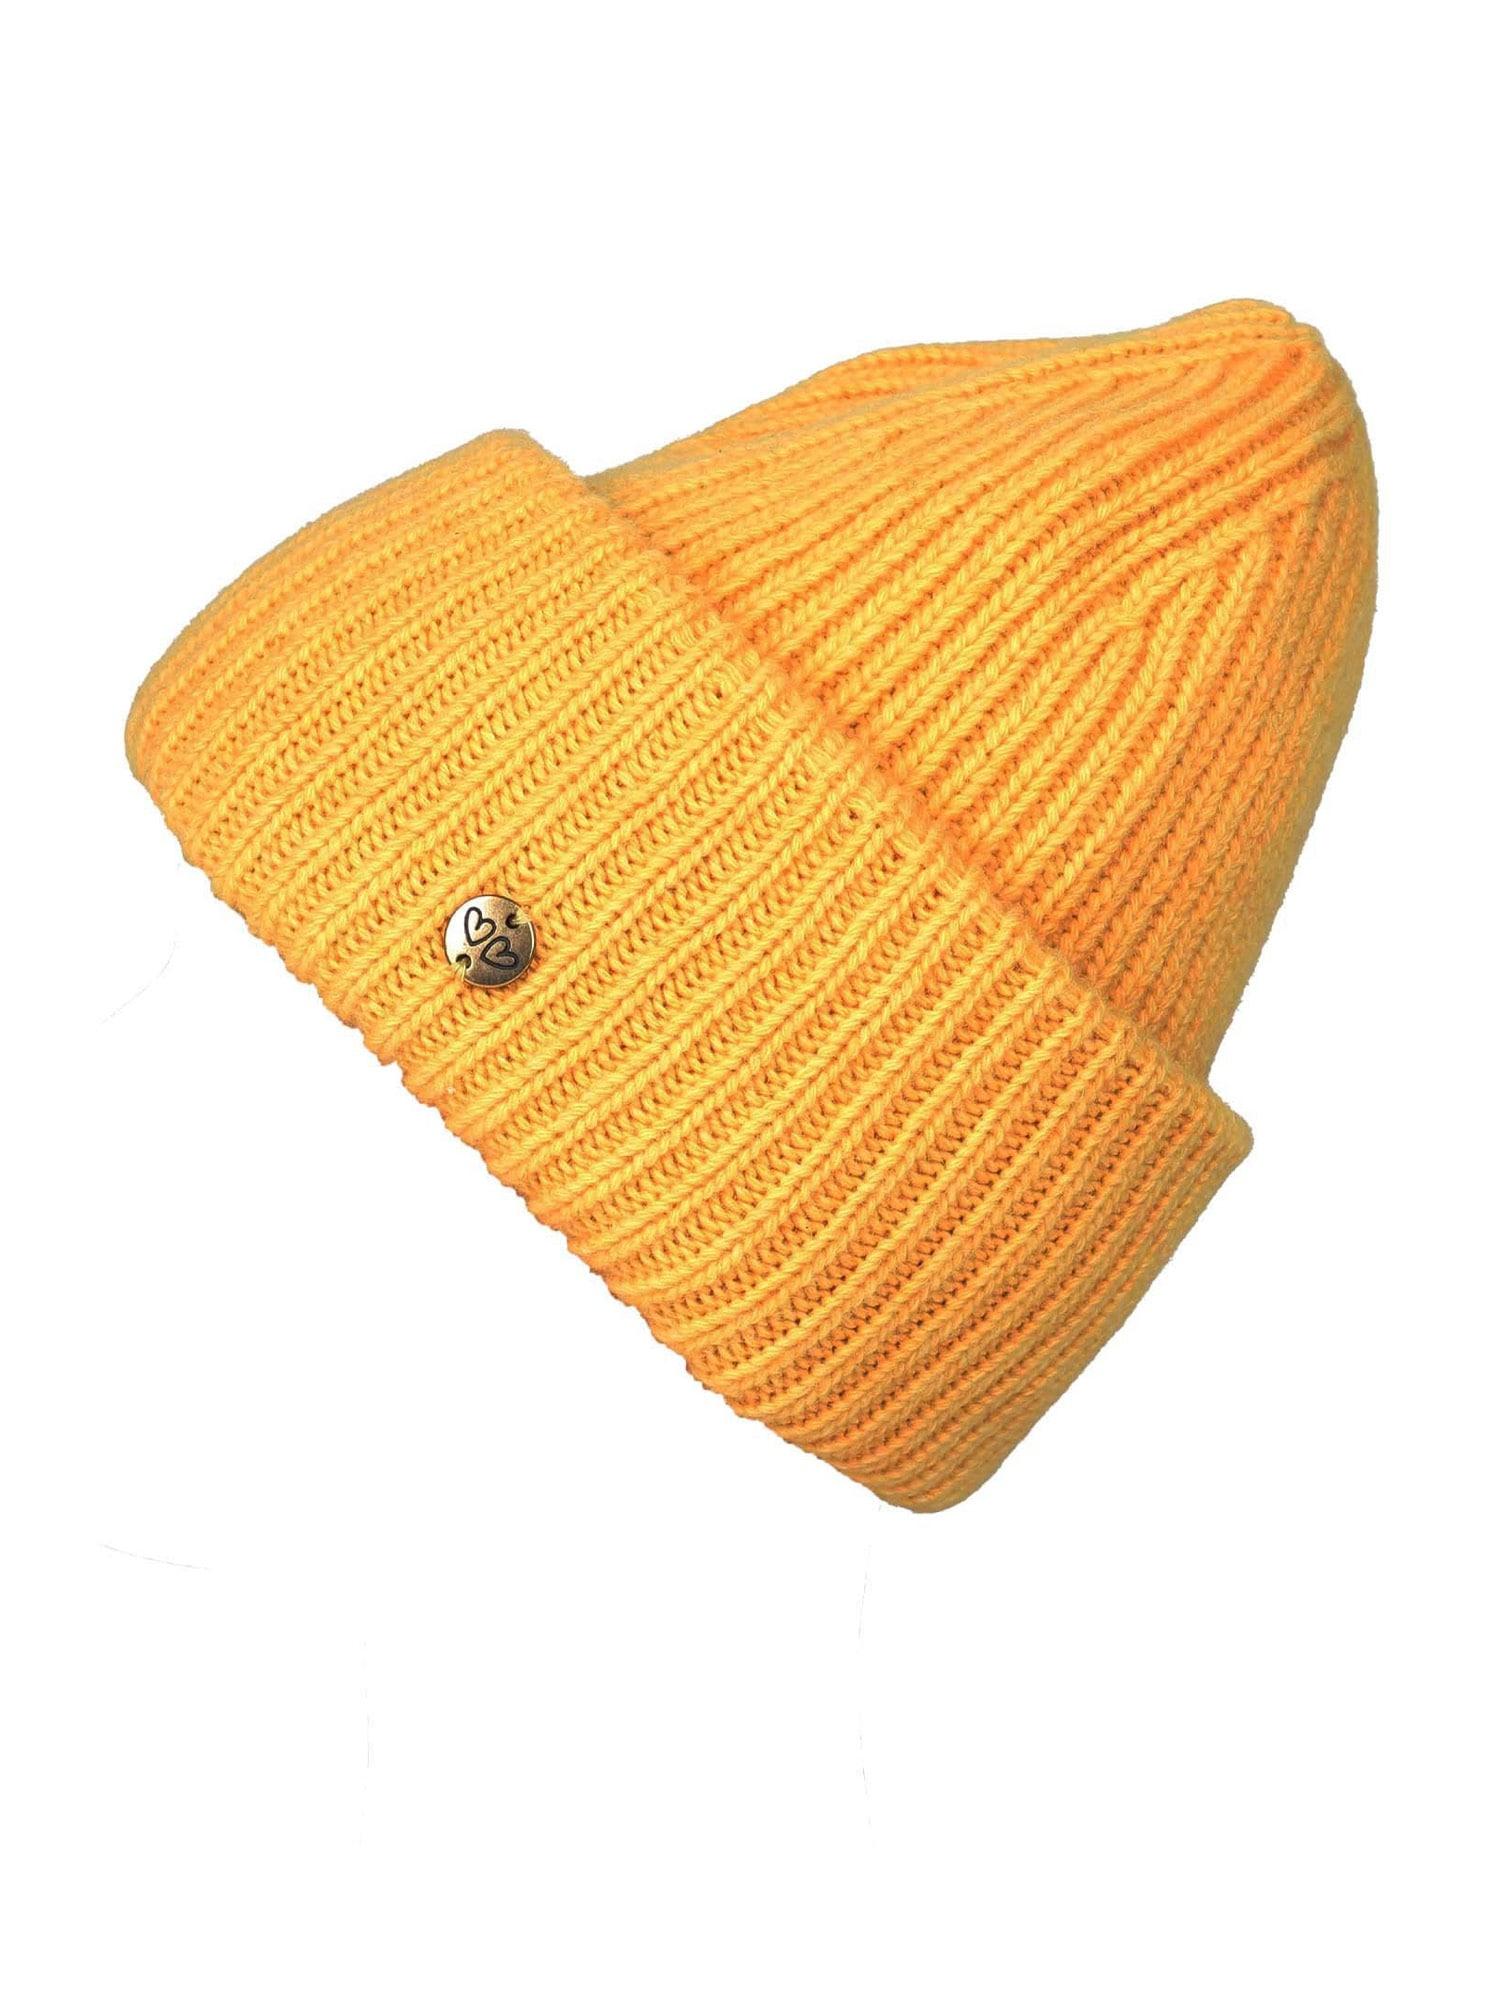 Zwillingsherz Megzta kepurė aukso geltonumo spalva